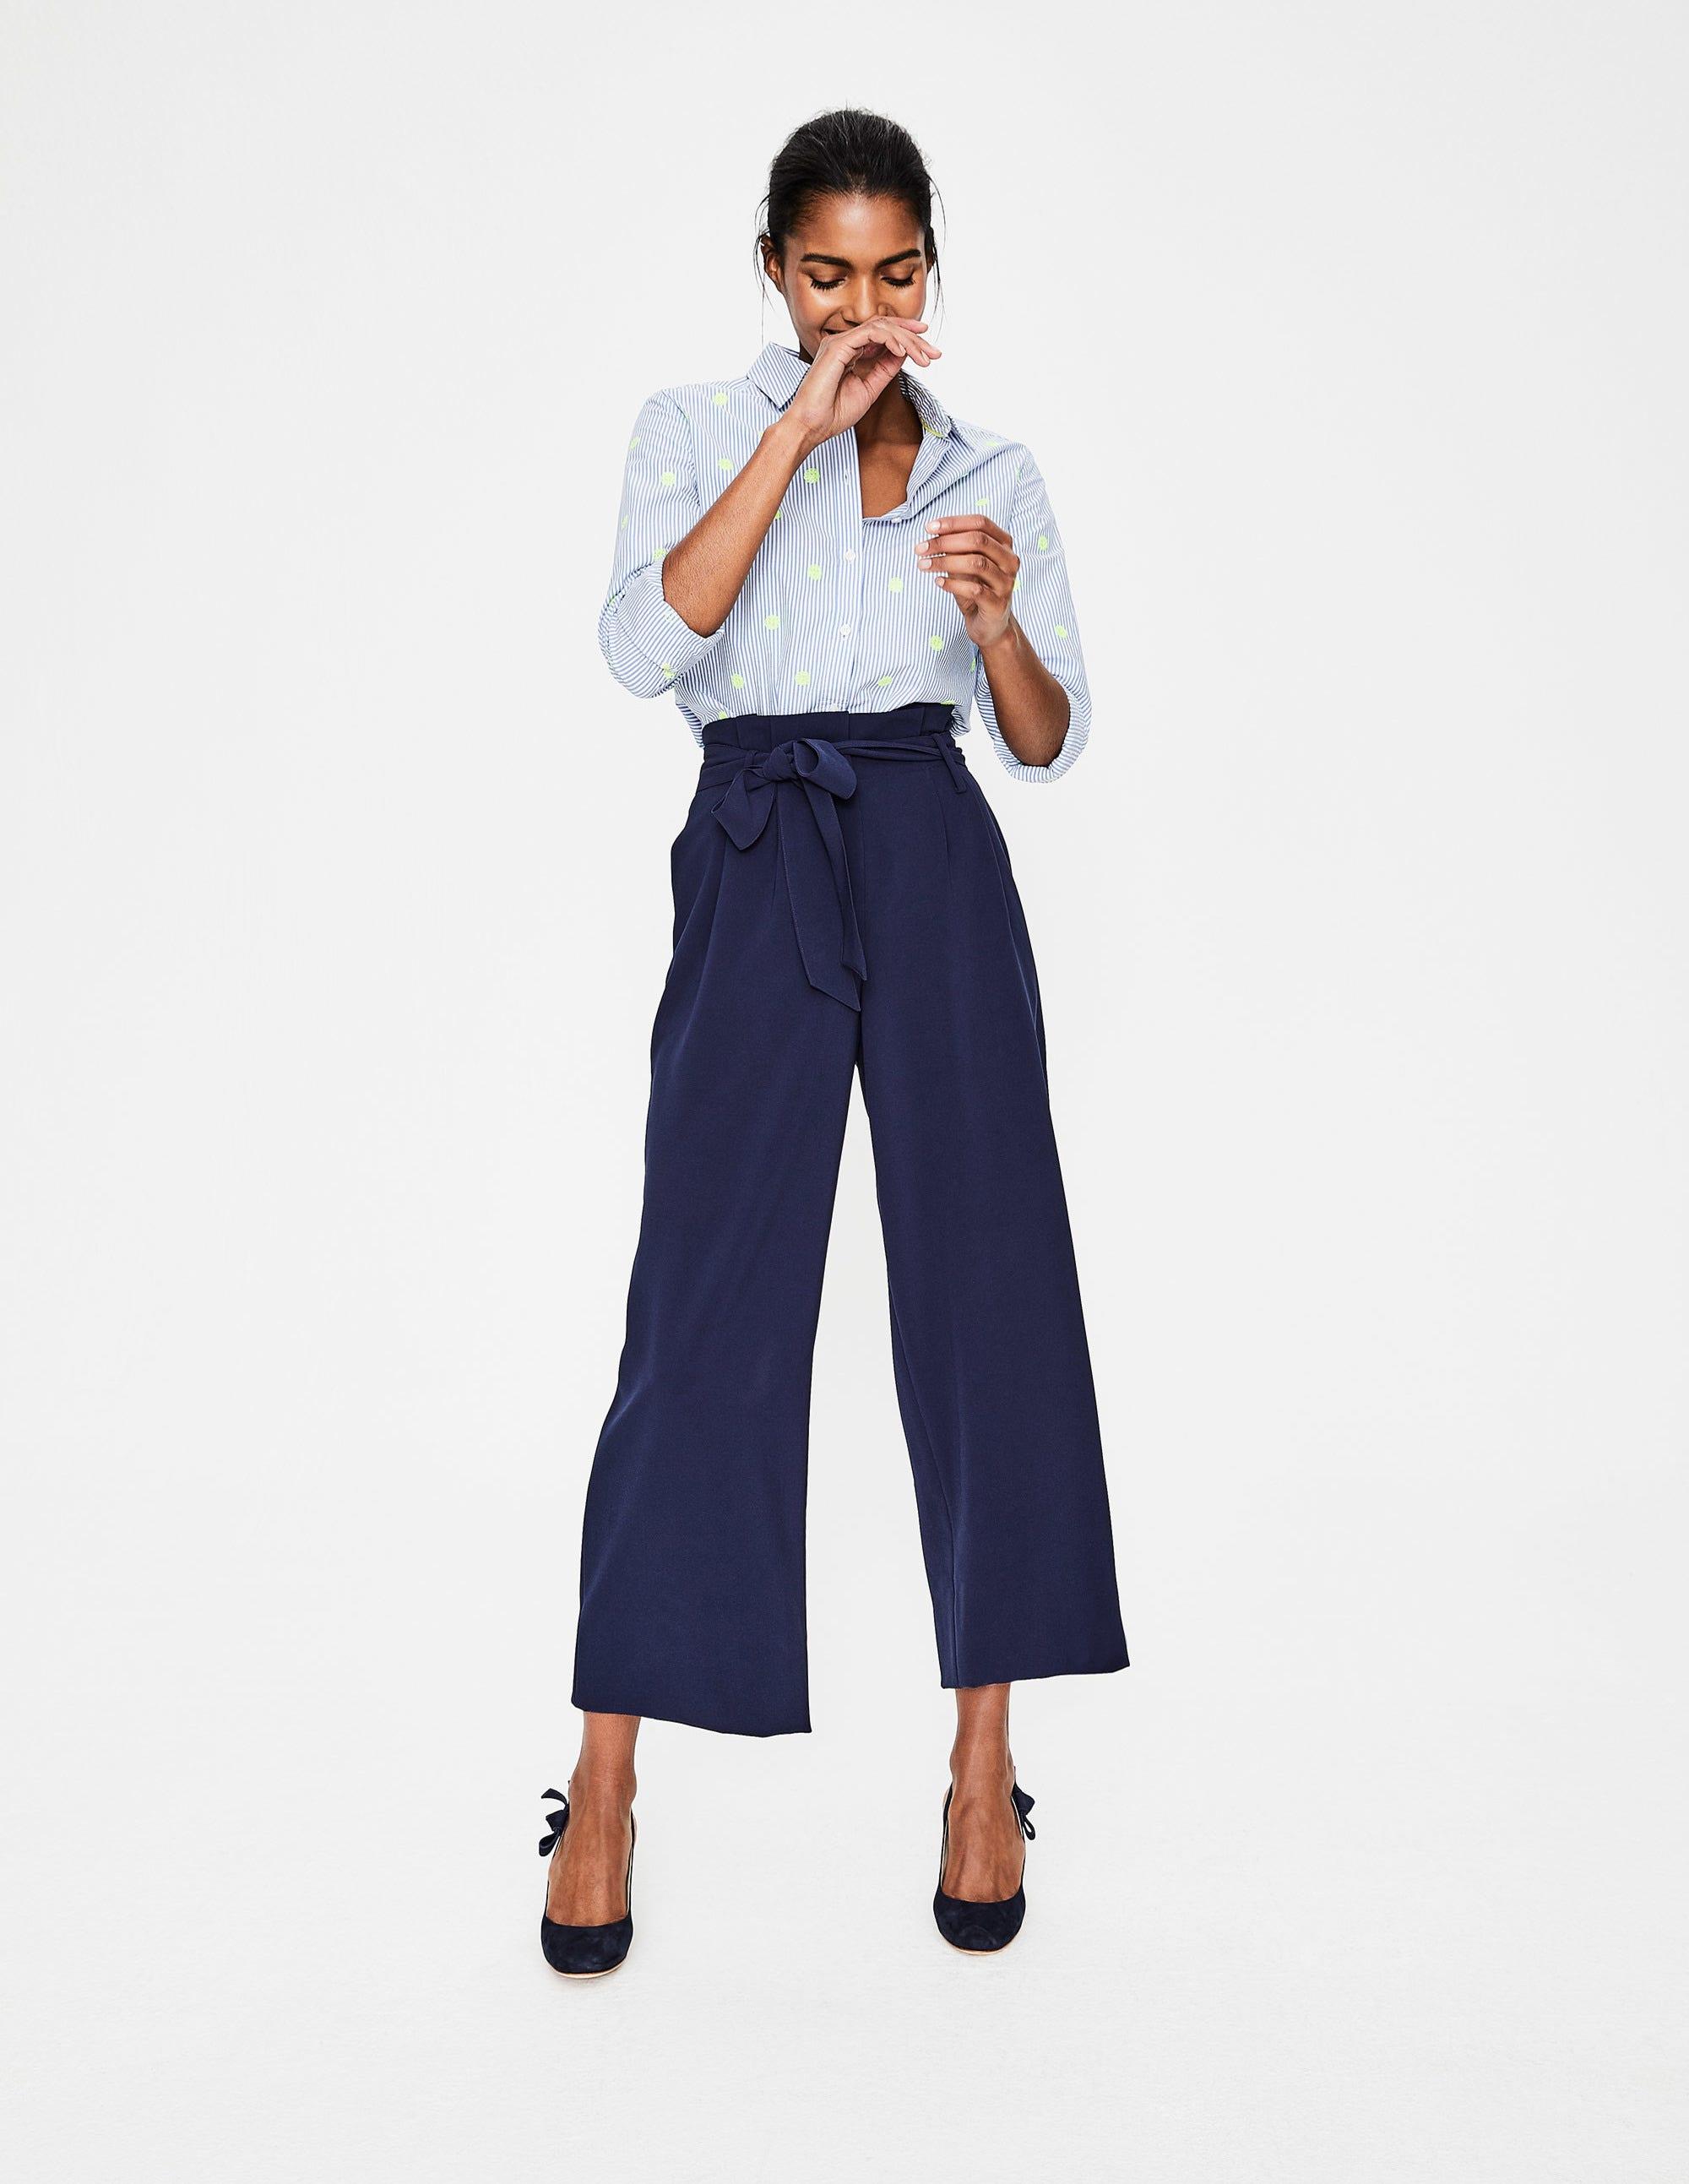 Boden Pantalon large Claremont Femme Boden enRH39